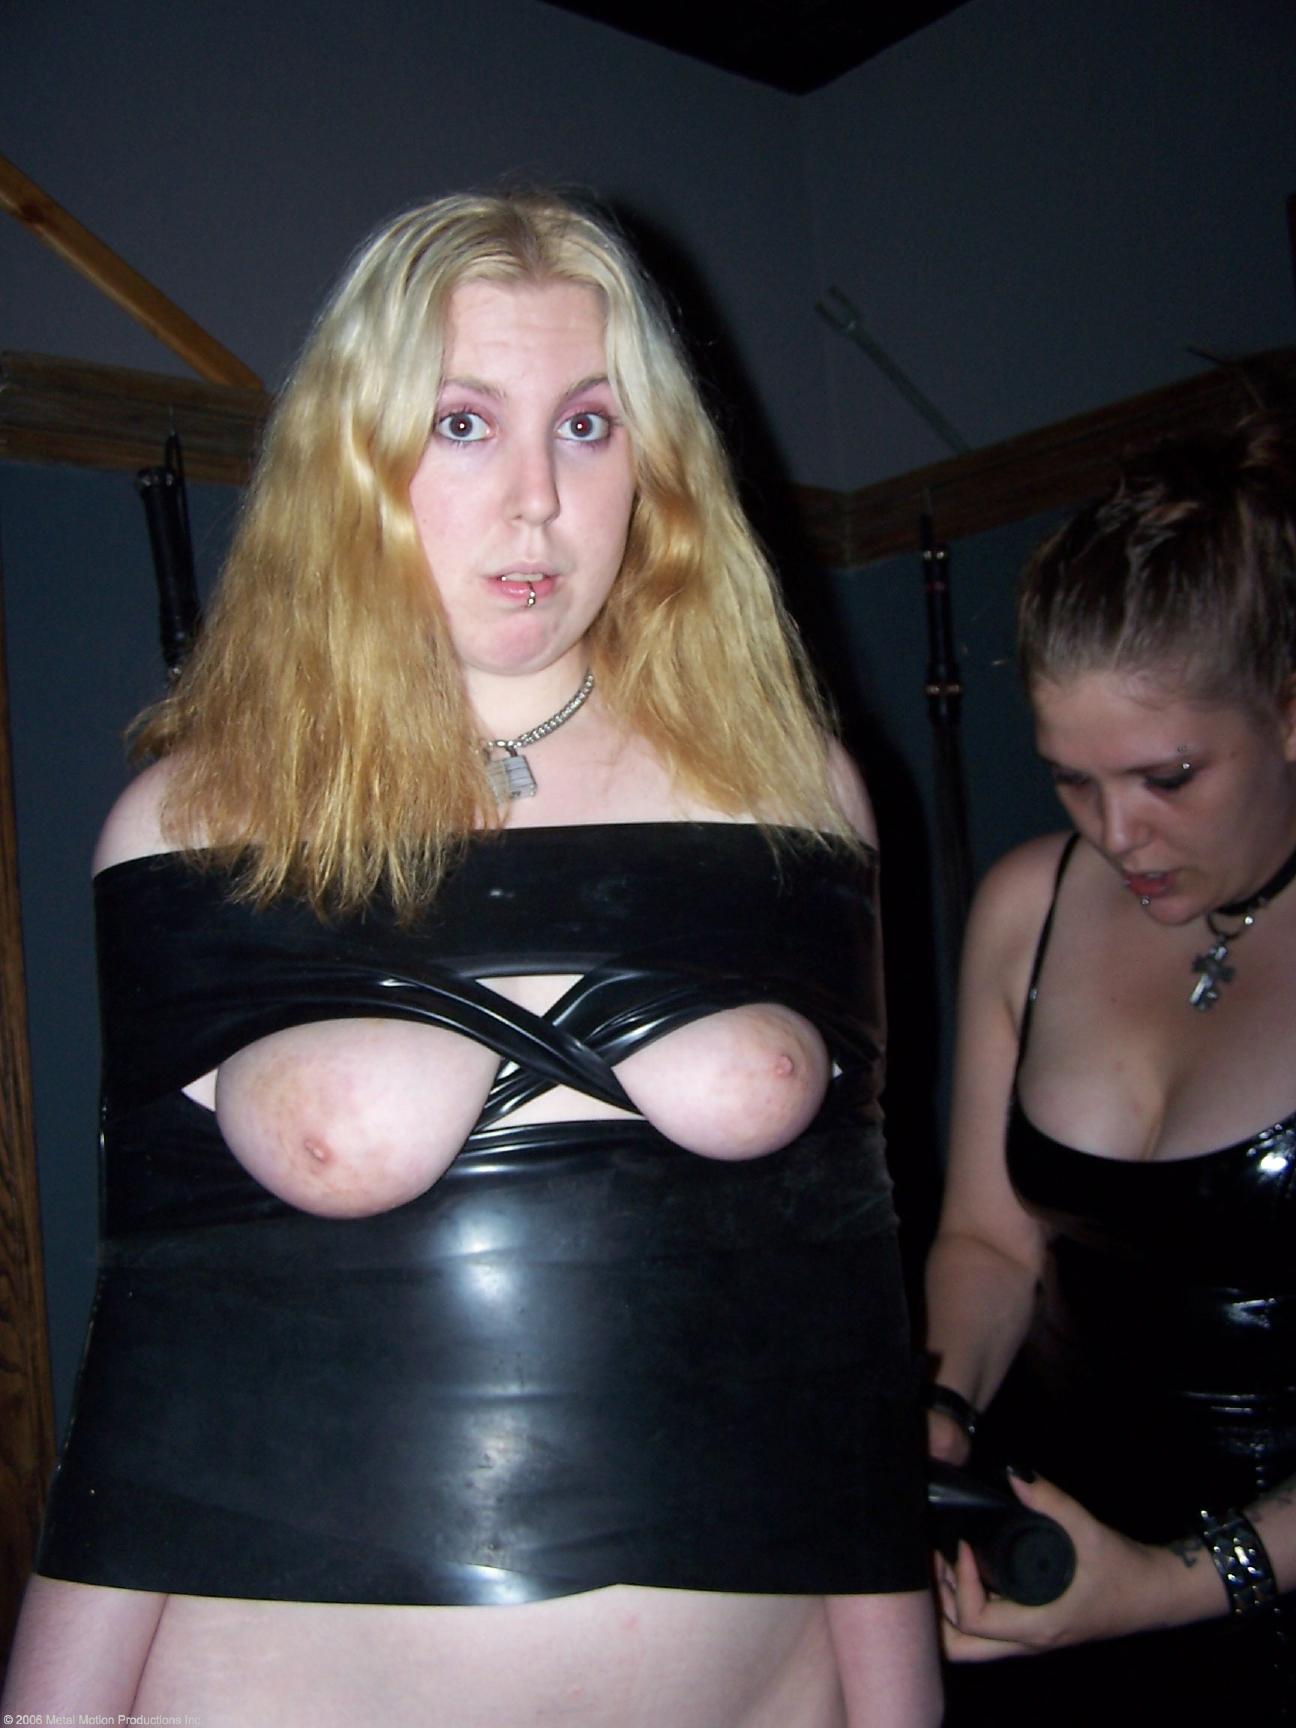 BDSM-Amateurpornos